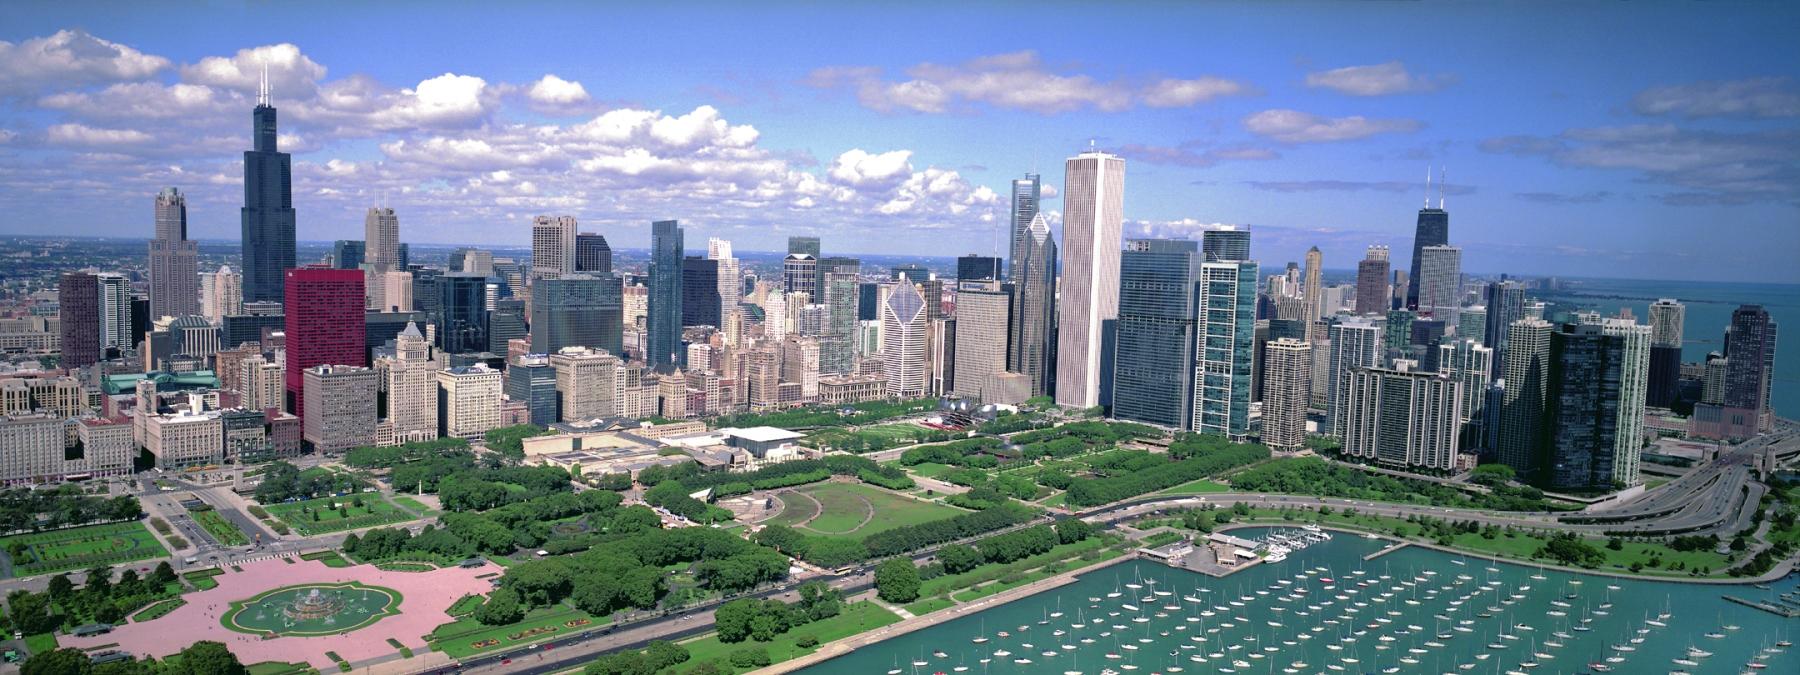 chicago skyline wall art